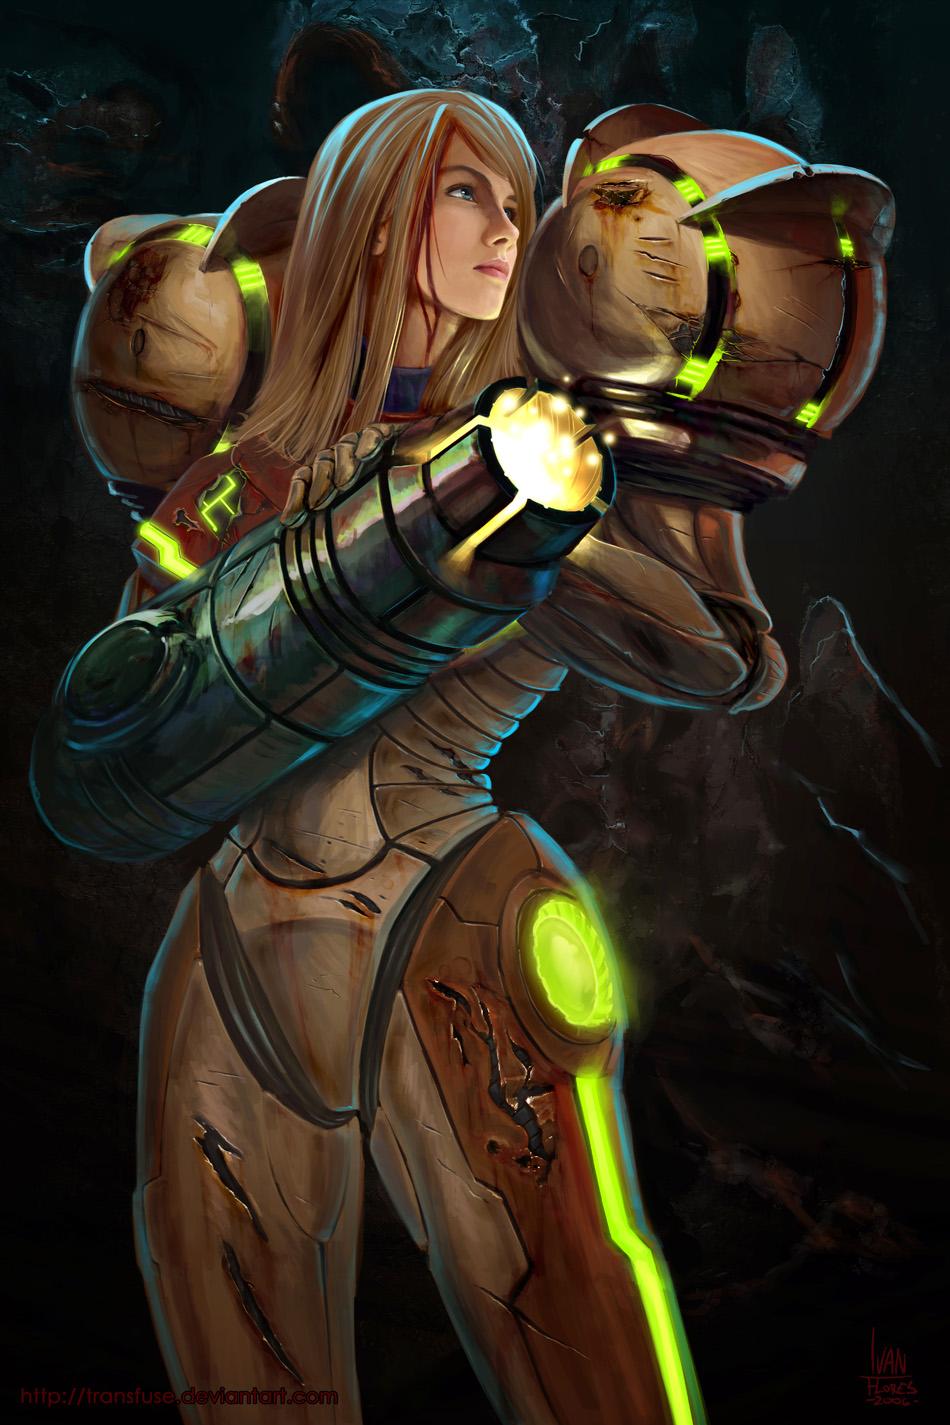 Samus Aran Metroid wallpaper hd